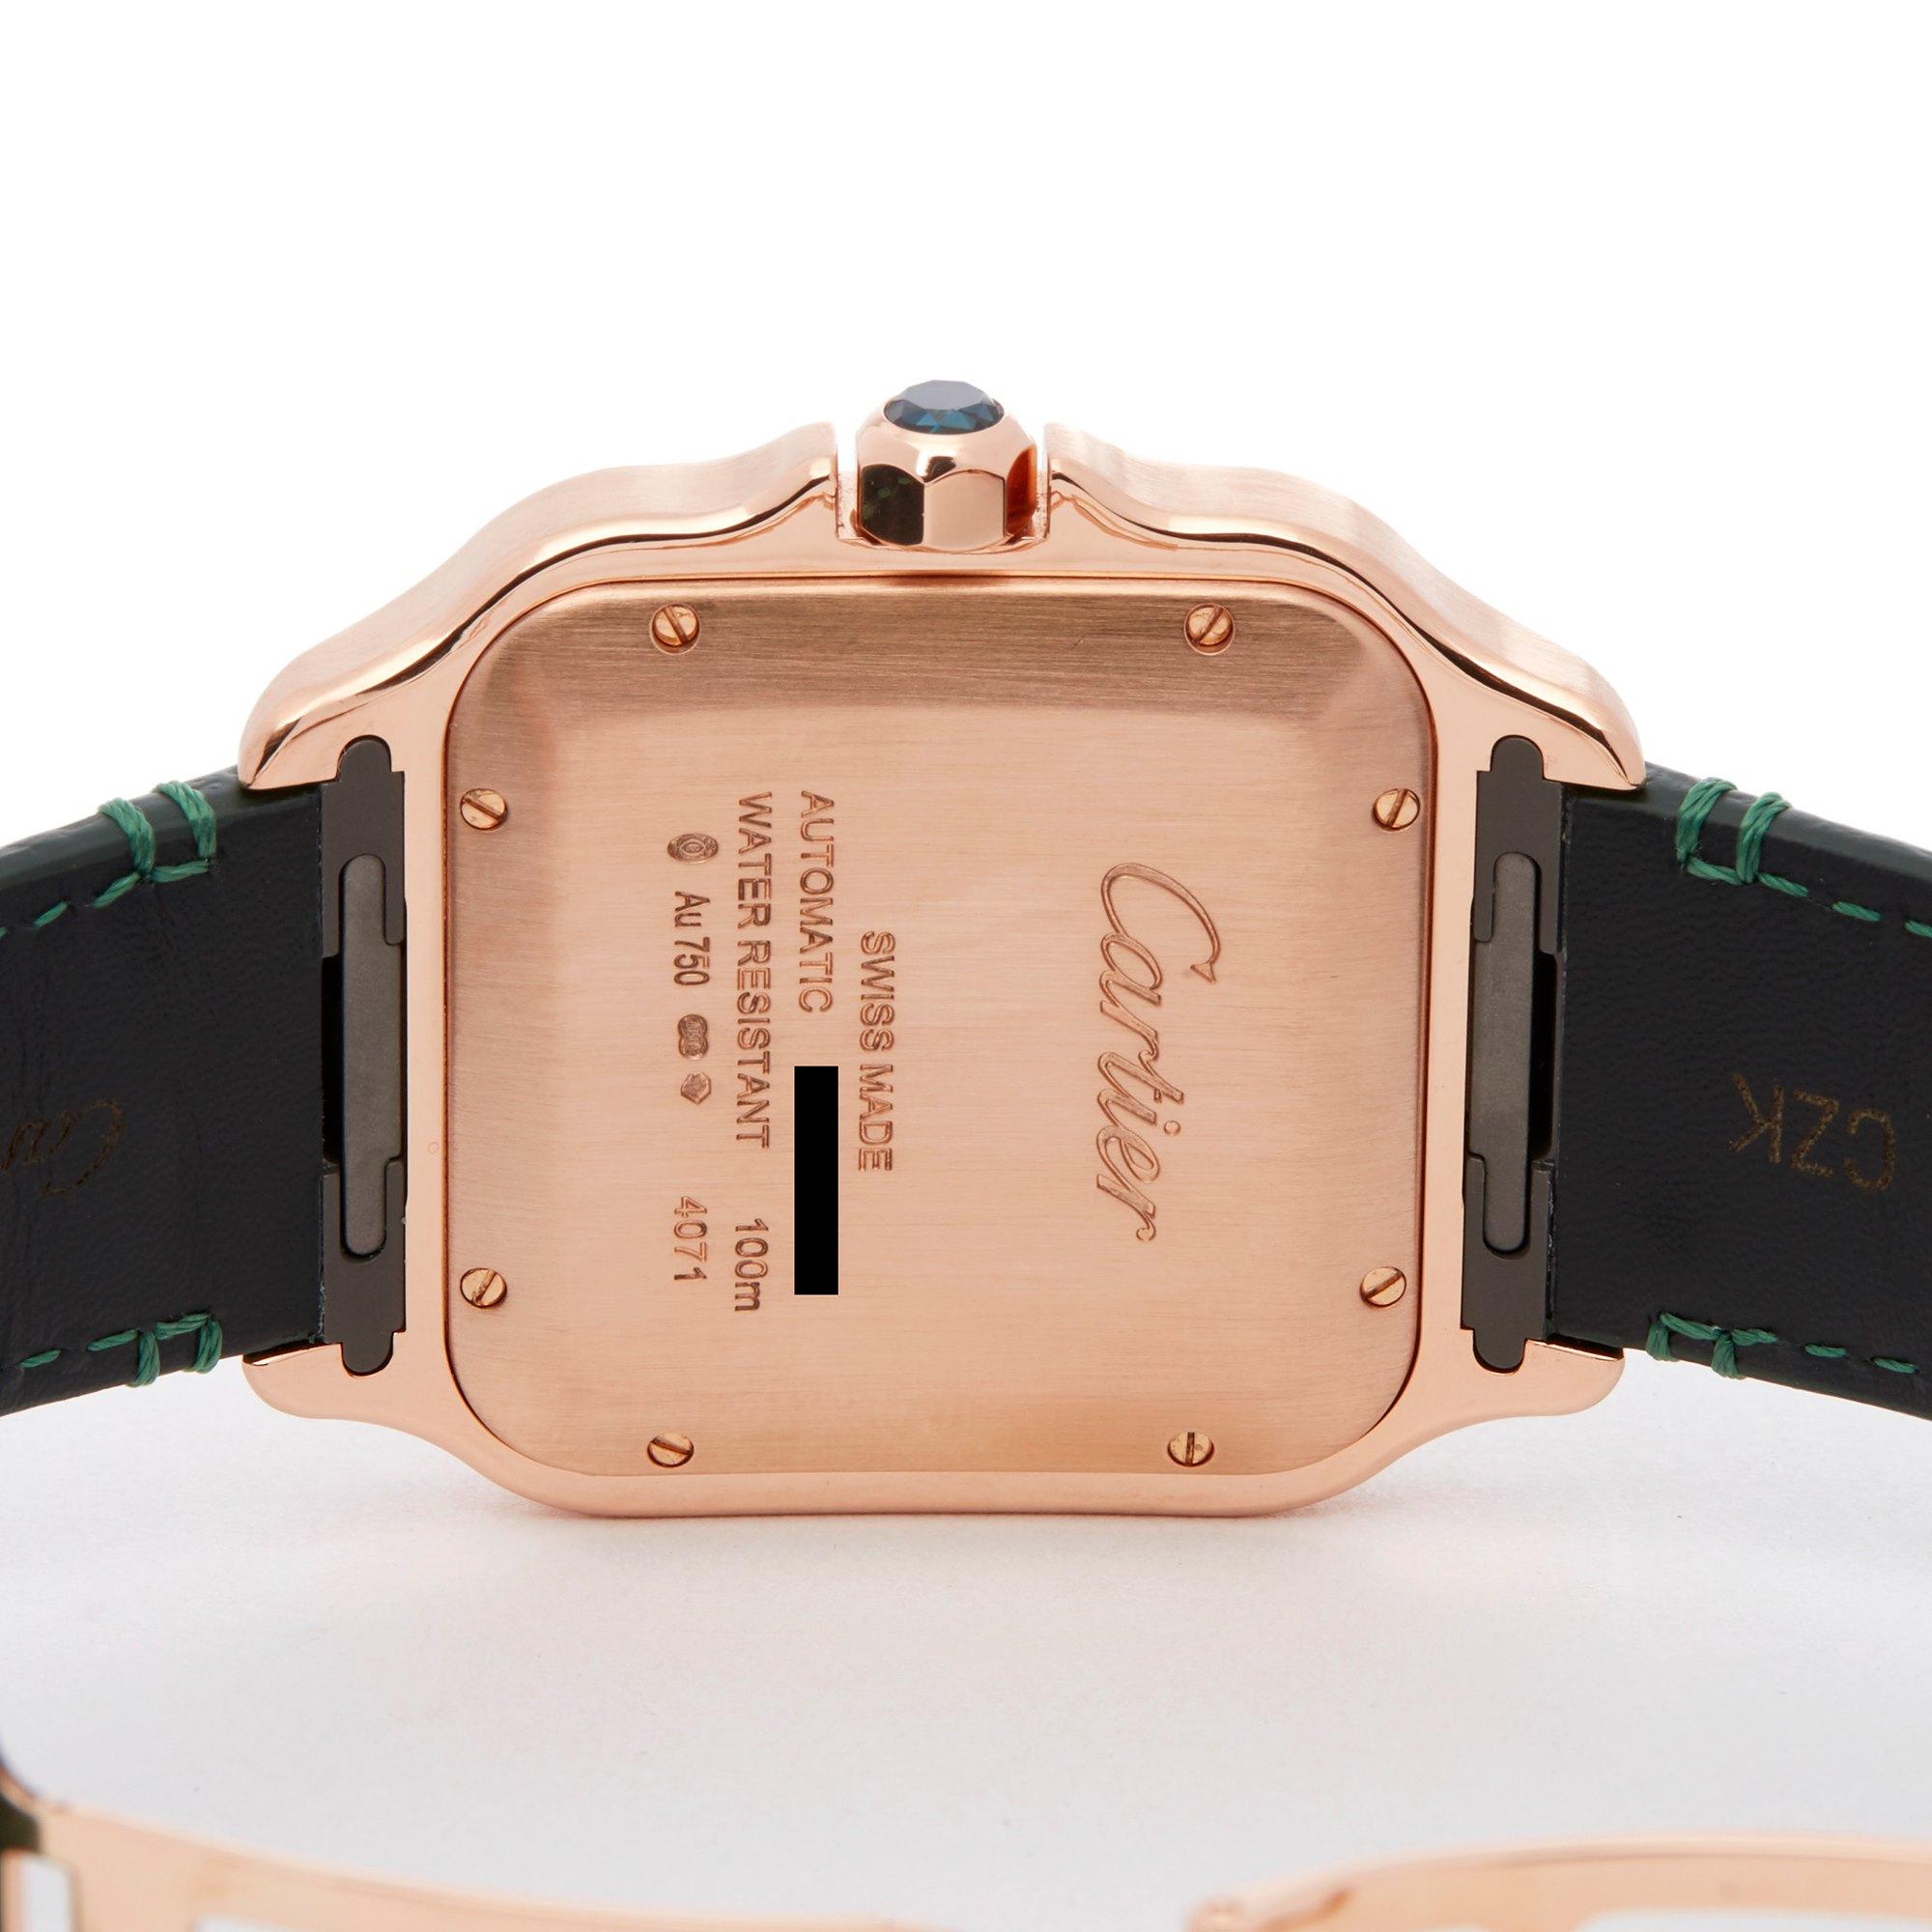 Cartier Santos De Cartier 18K Rose Goud WGSA0011 or 4071